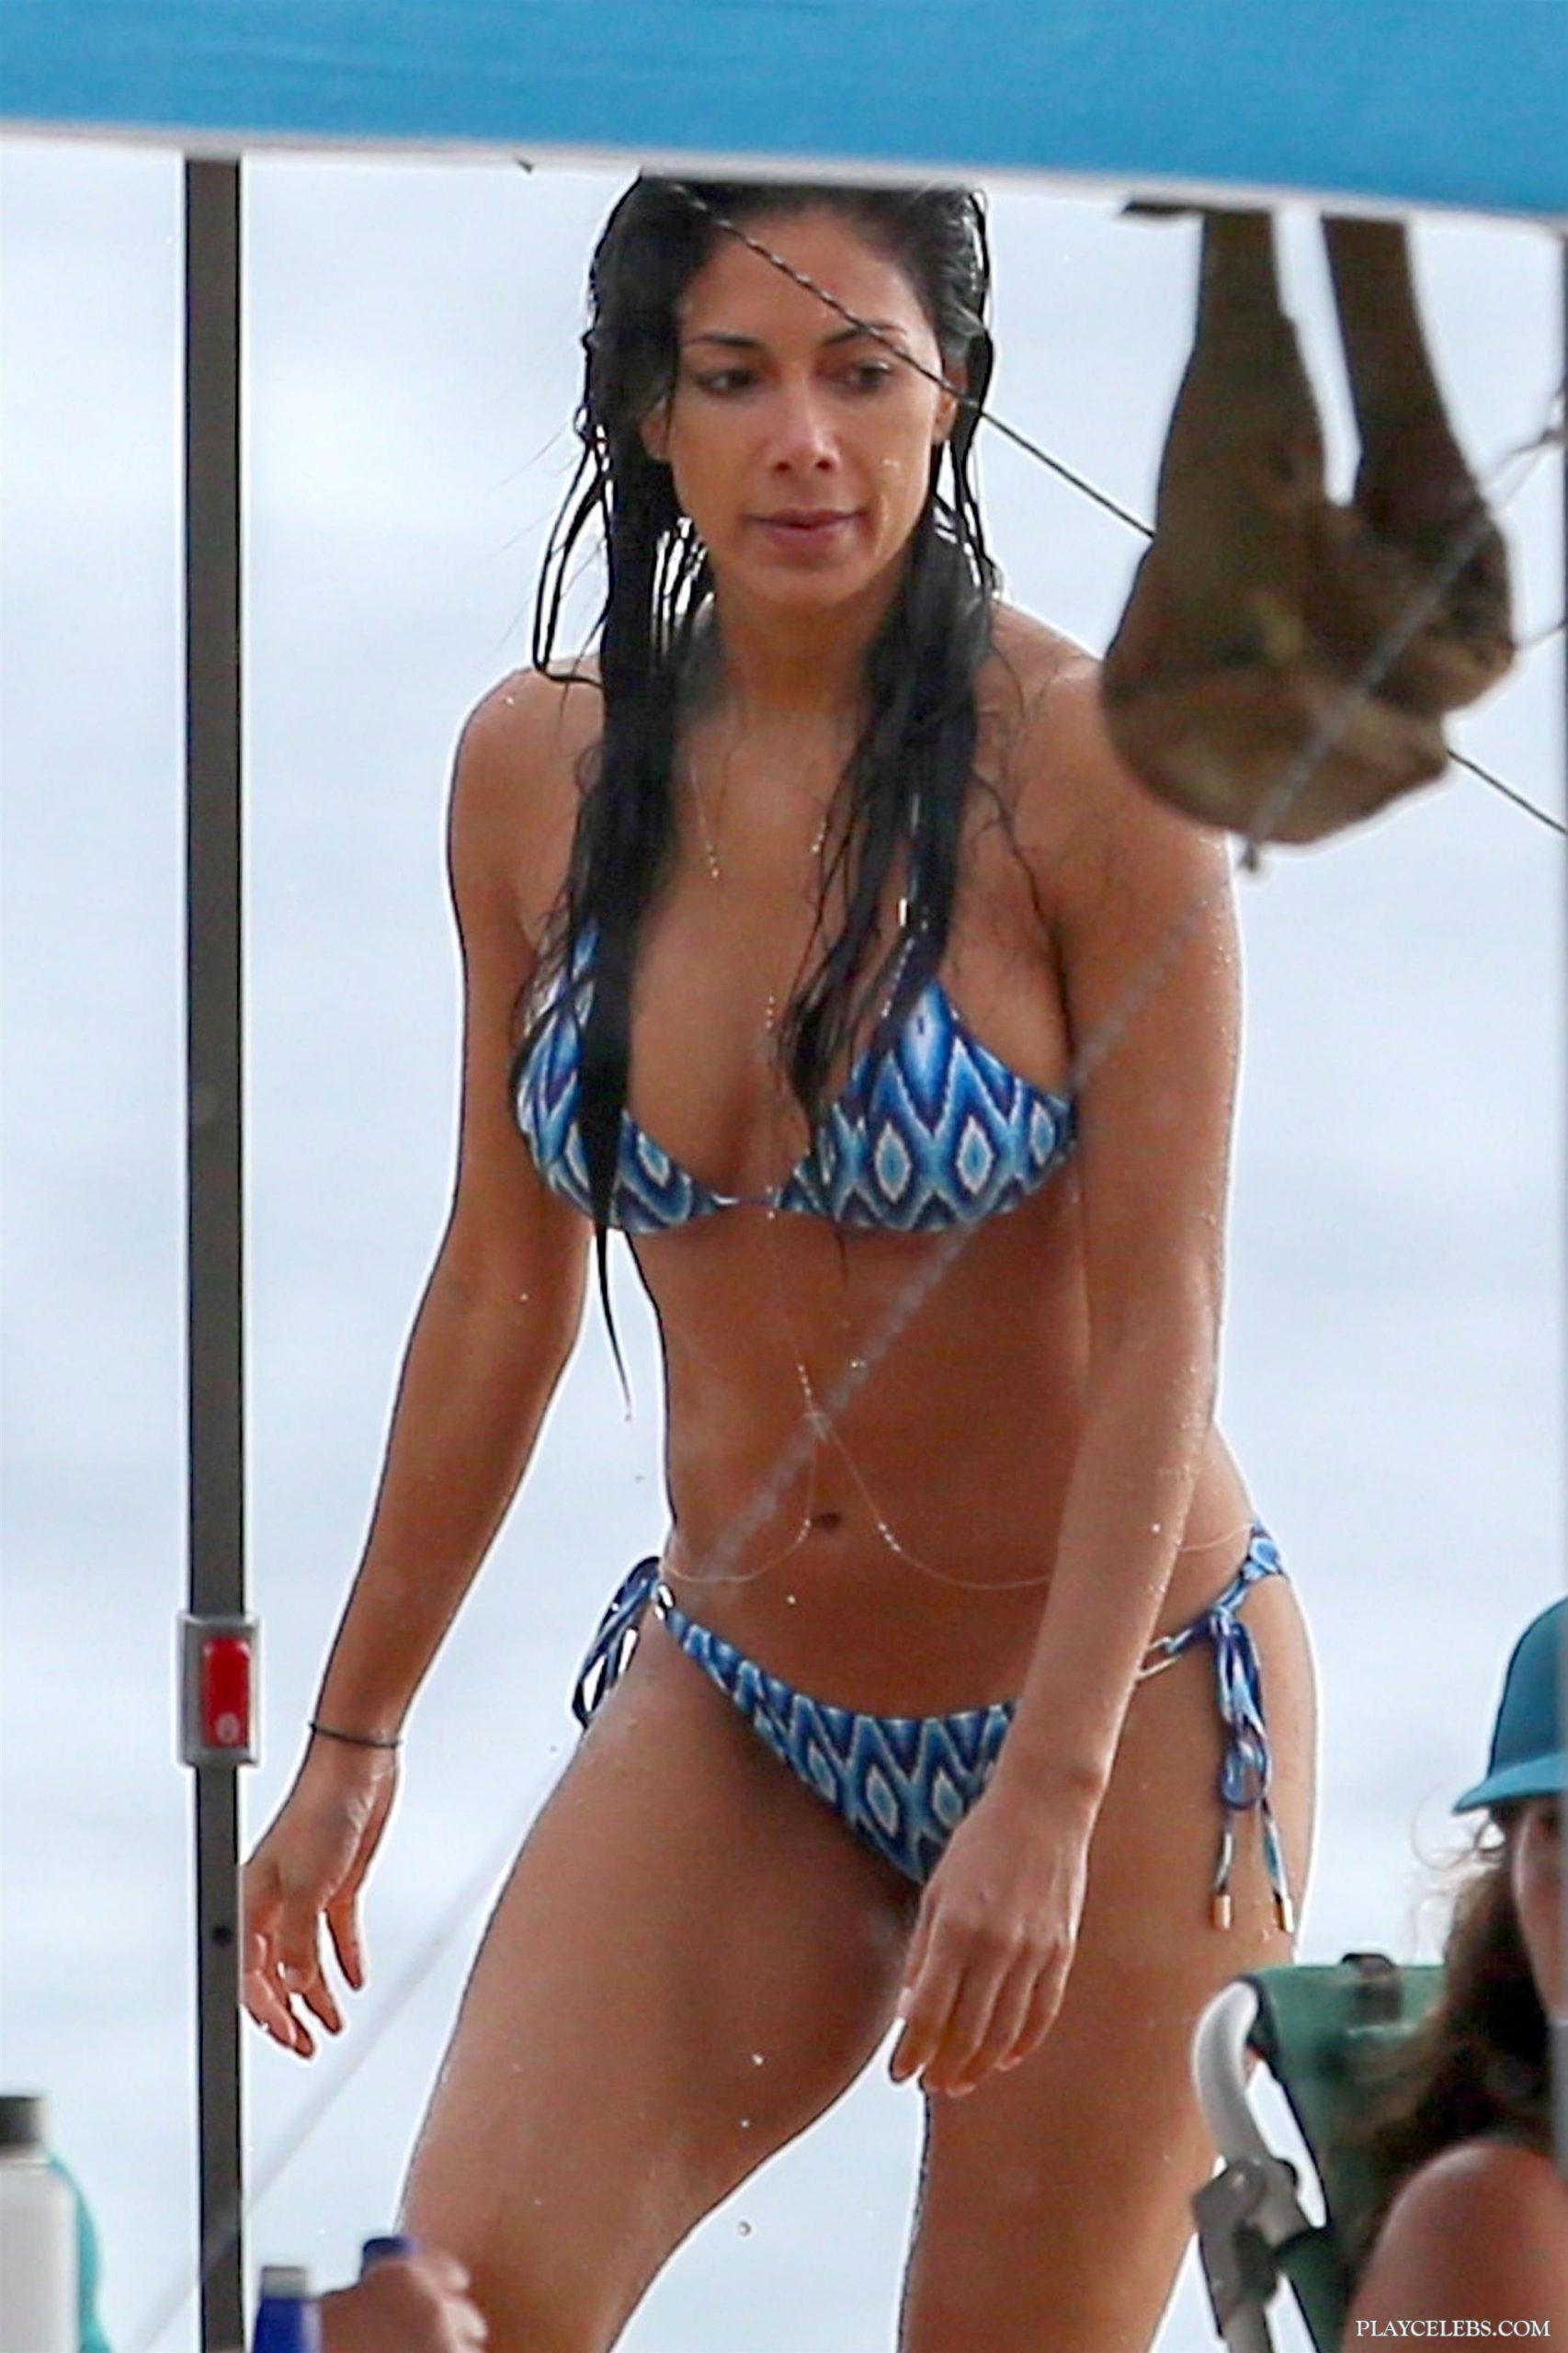 Nicole Scherzinger Caught By Paparazzi In Sexy Bikini